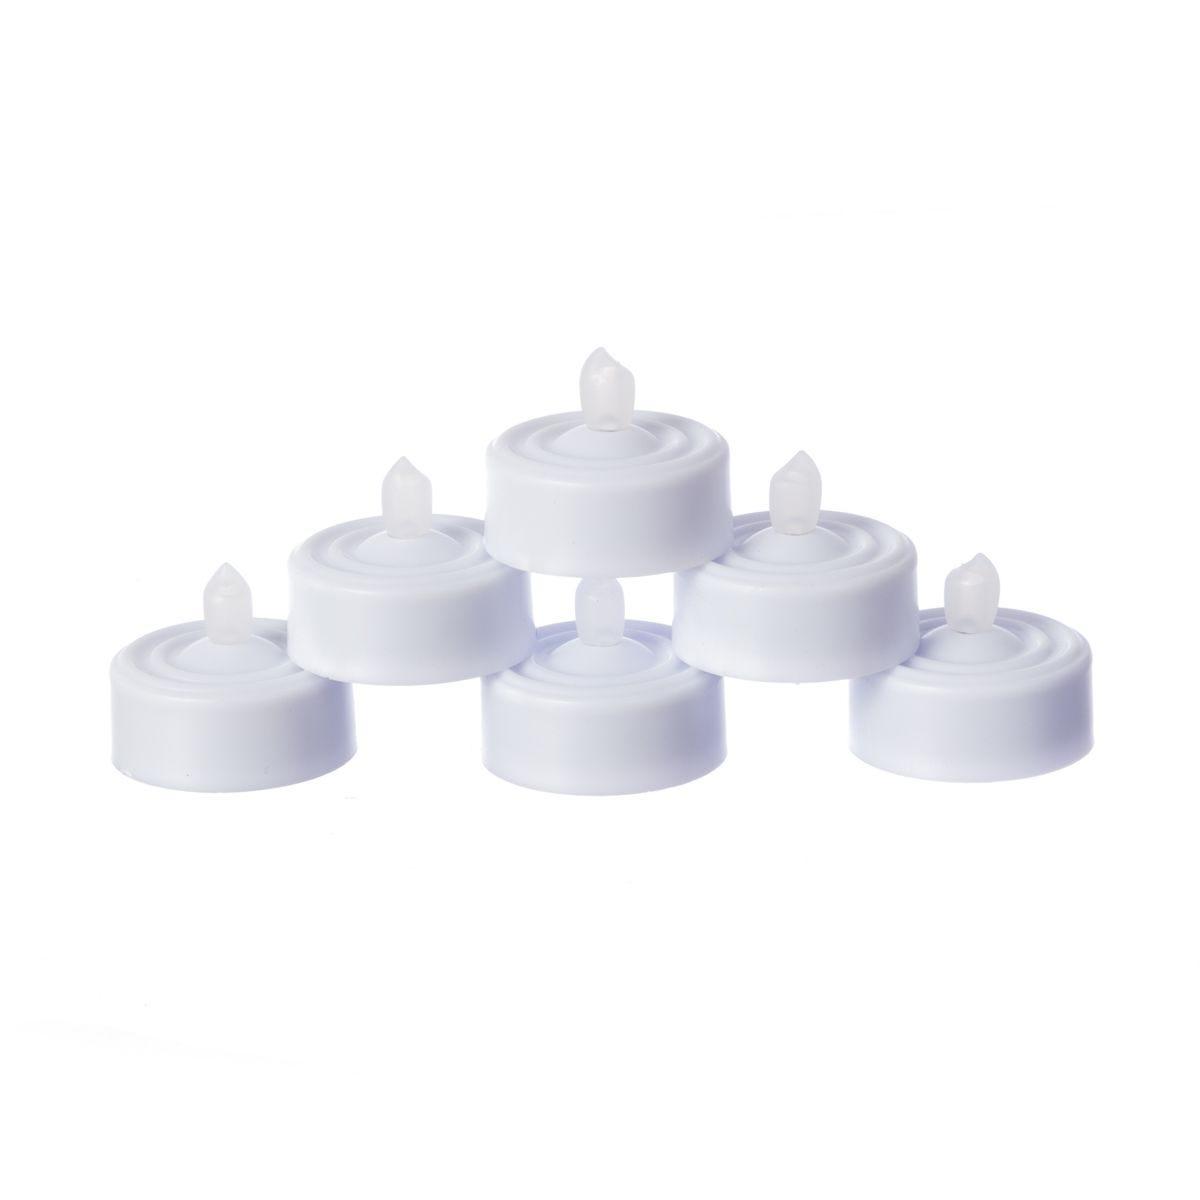 Flickering LED Tea Lights - Pack of 6